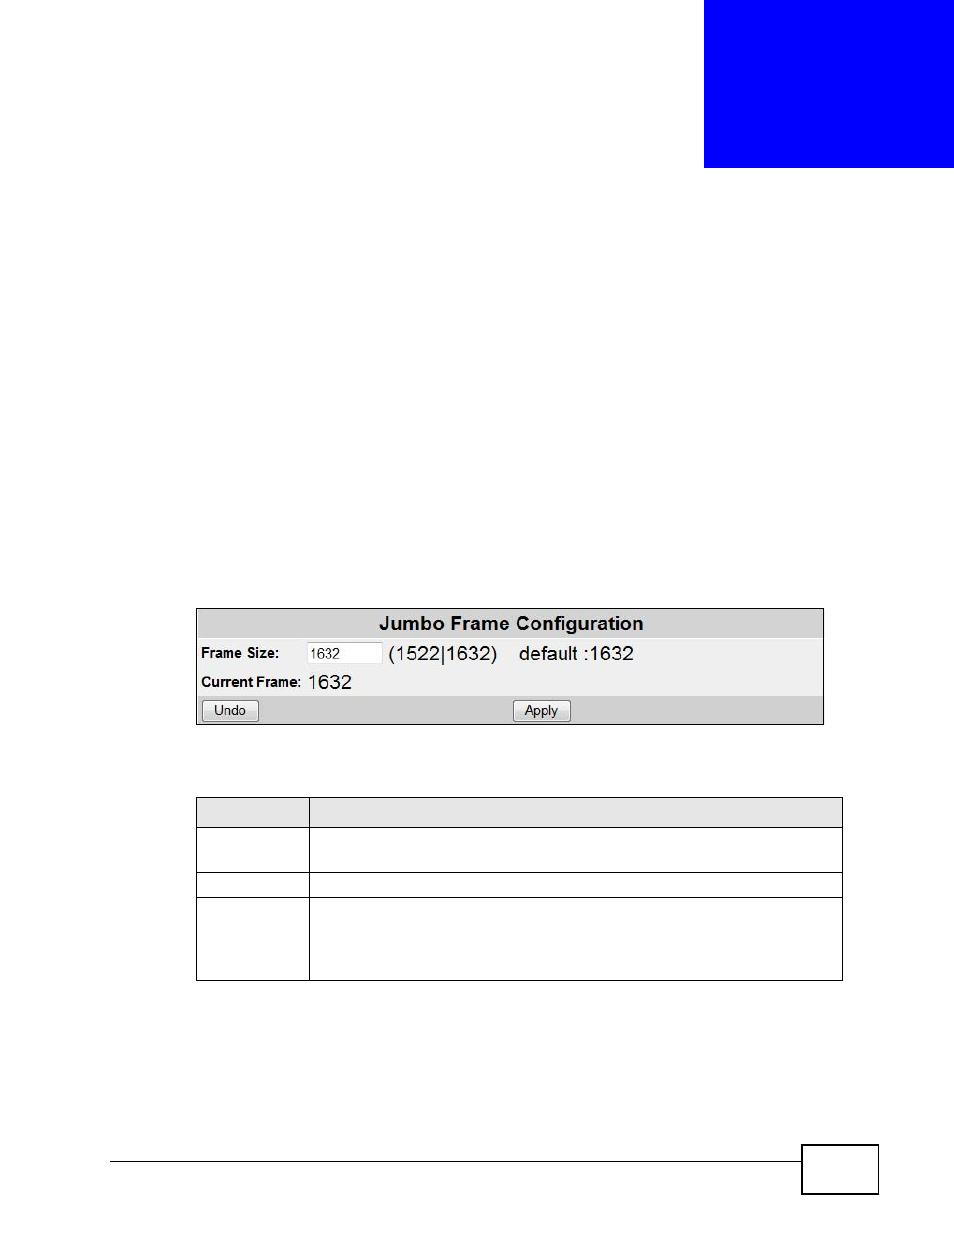 Jumbo frame, 1 overview, 2 the jumbo frame configuration screen ...